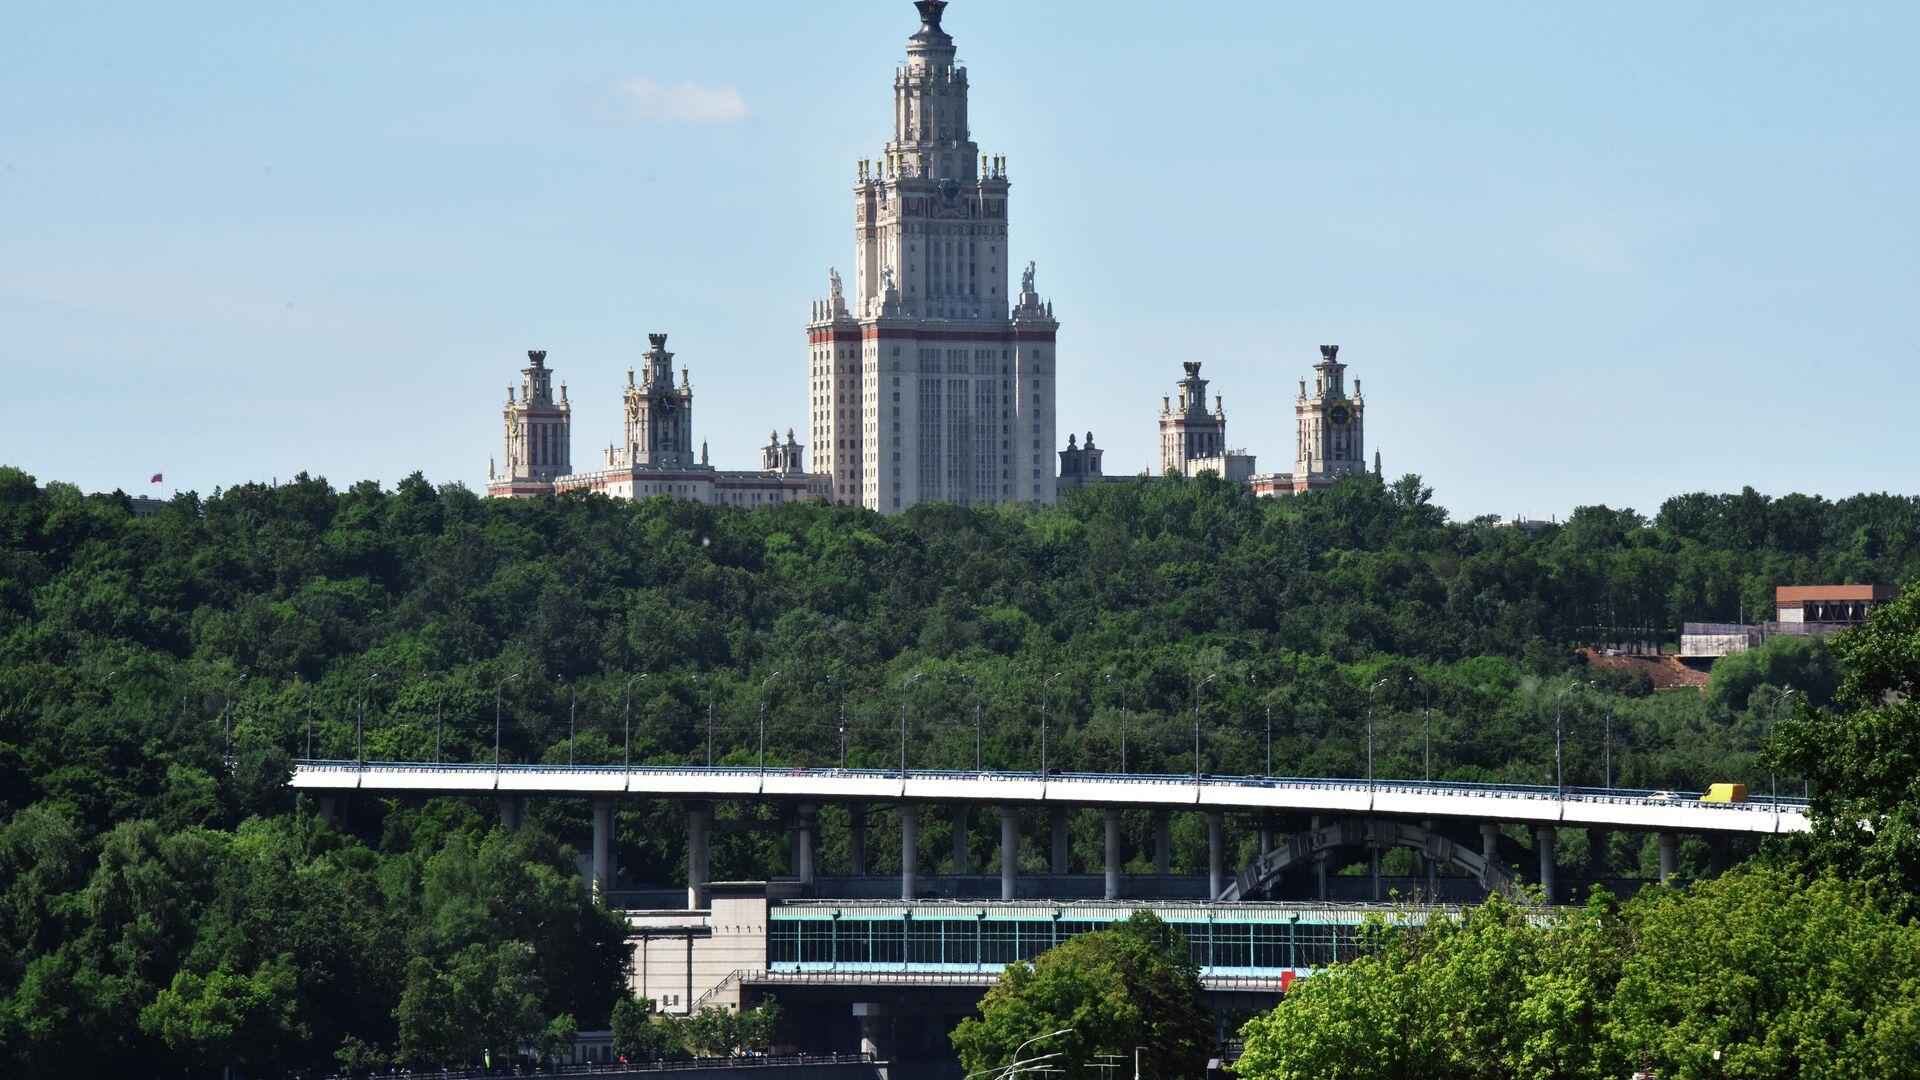 Мост Лужники через Москву-реку - РИА Новости, 1920, 23.07.2021